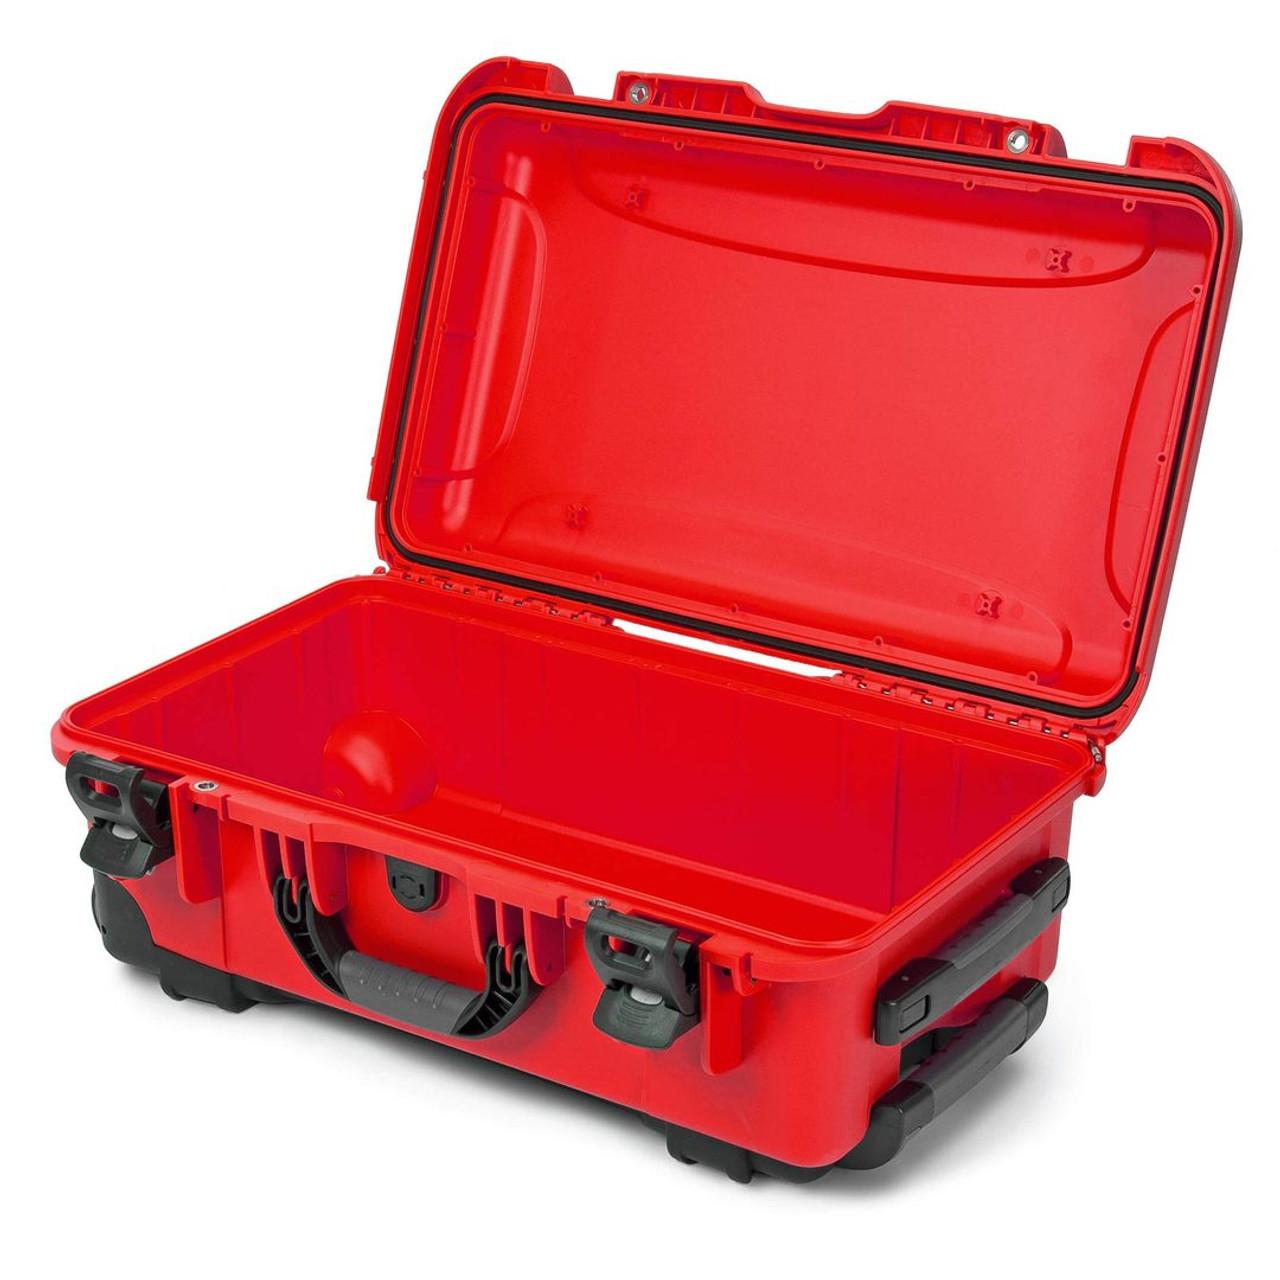 Nanuk 935 First Aid Case (Empty)